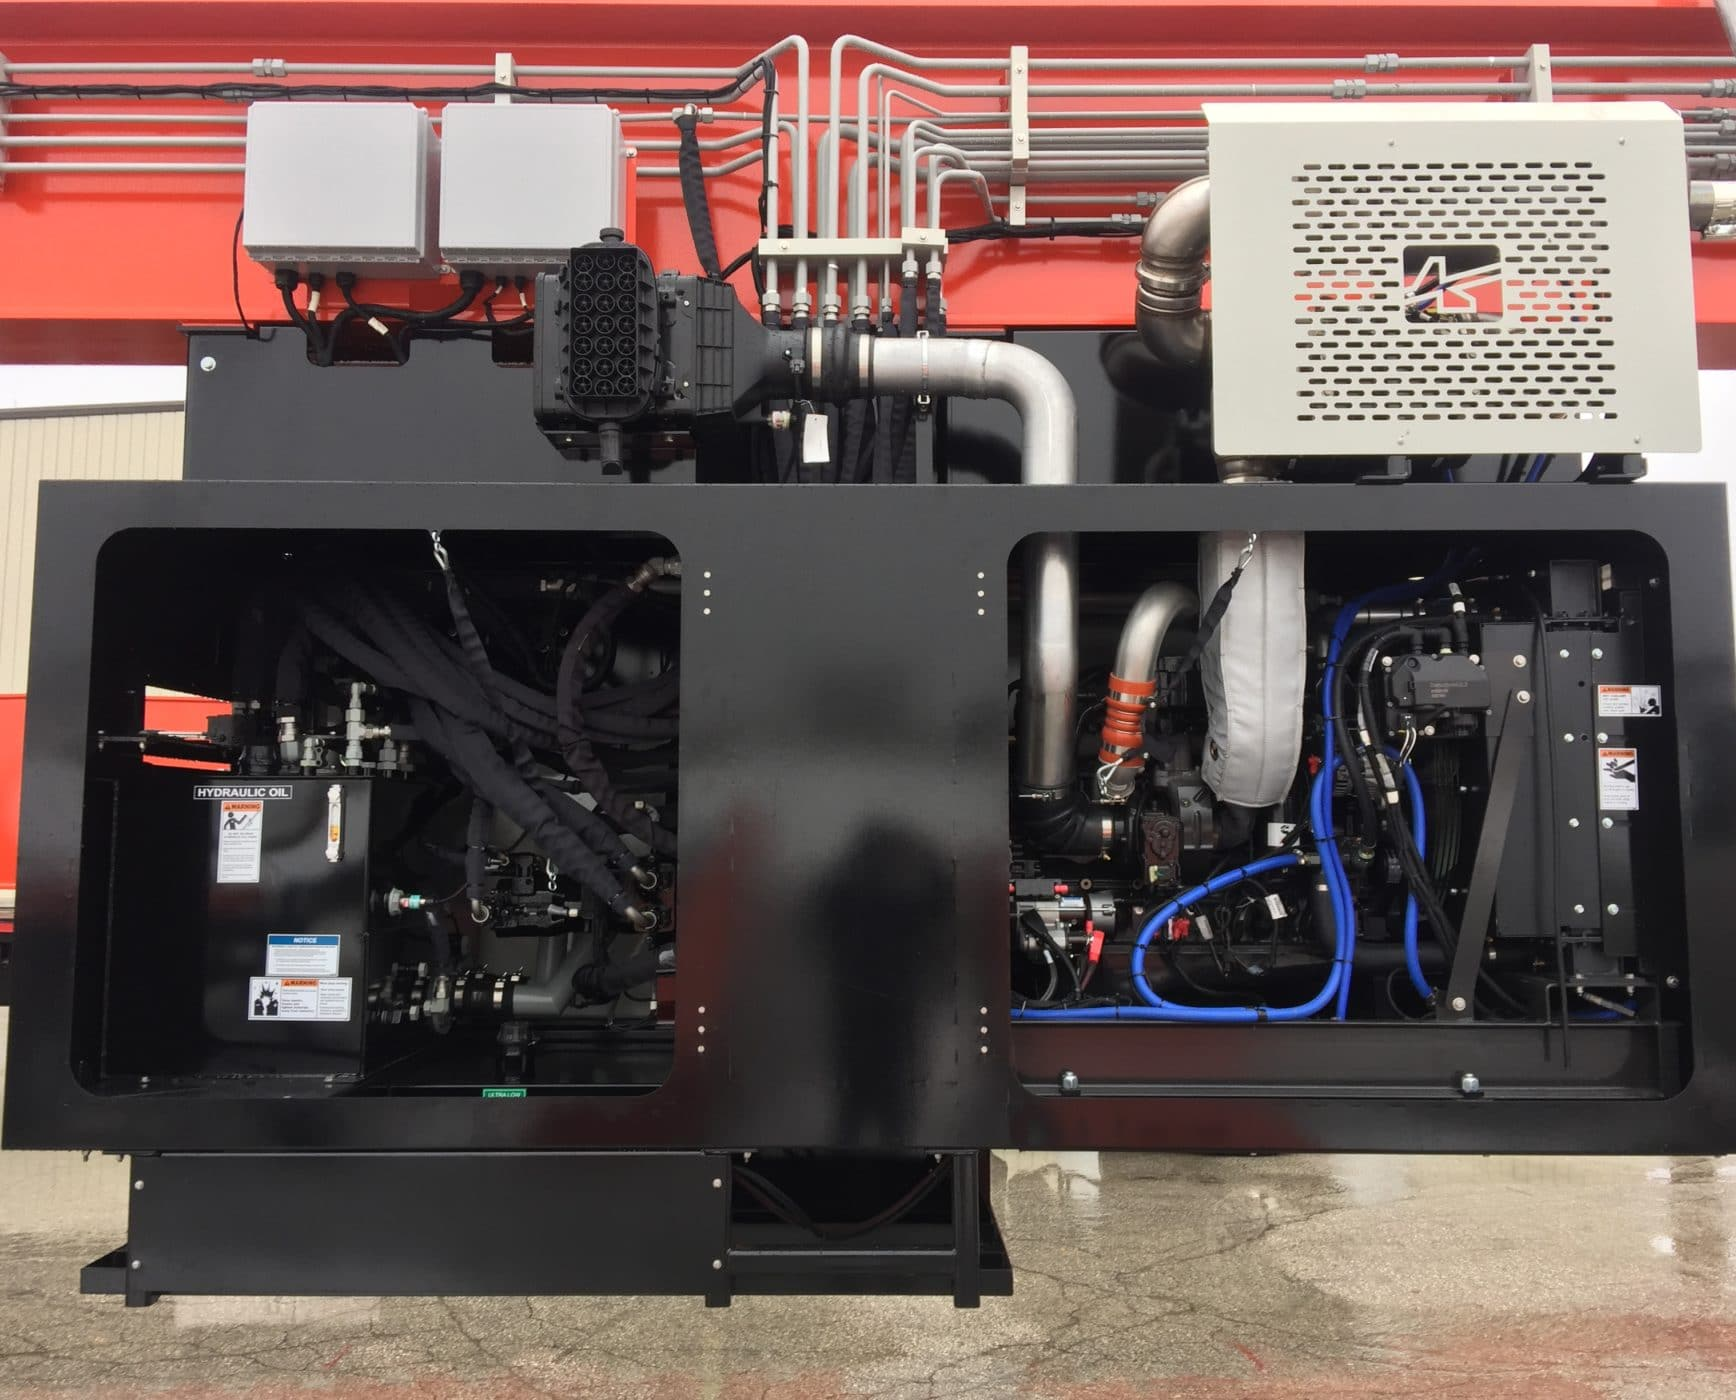 Mobile Gantry Crane for Lifting Engine